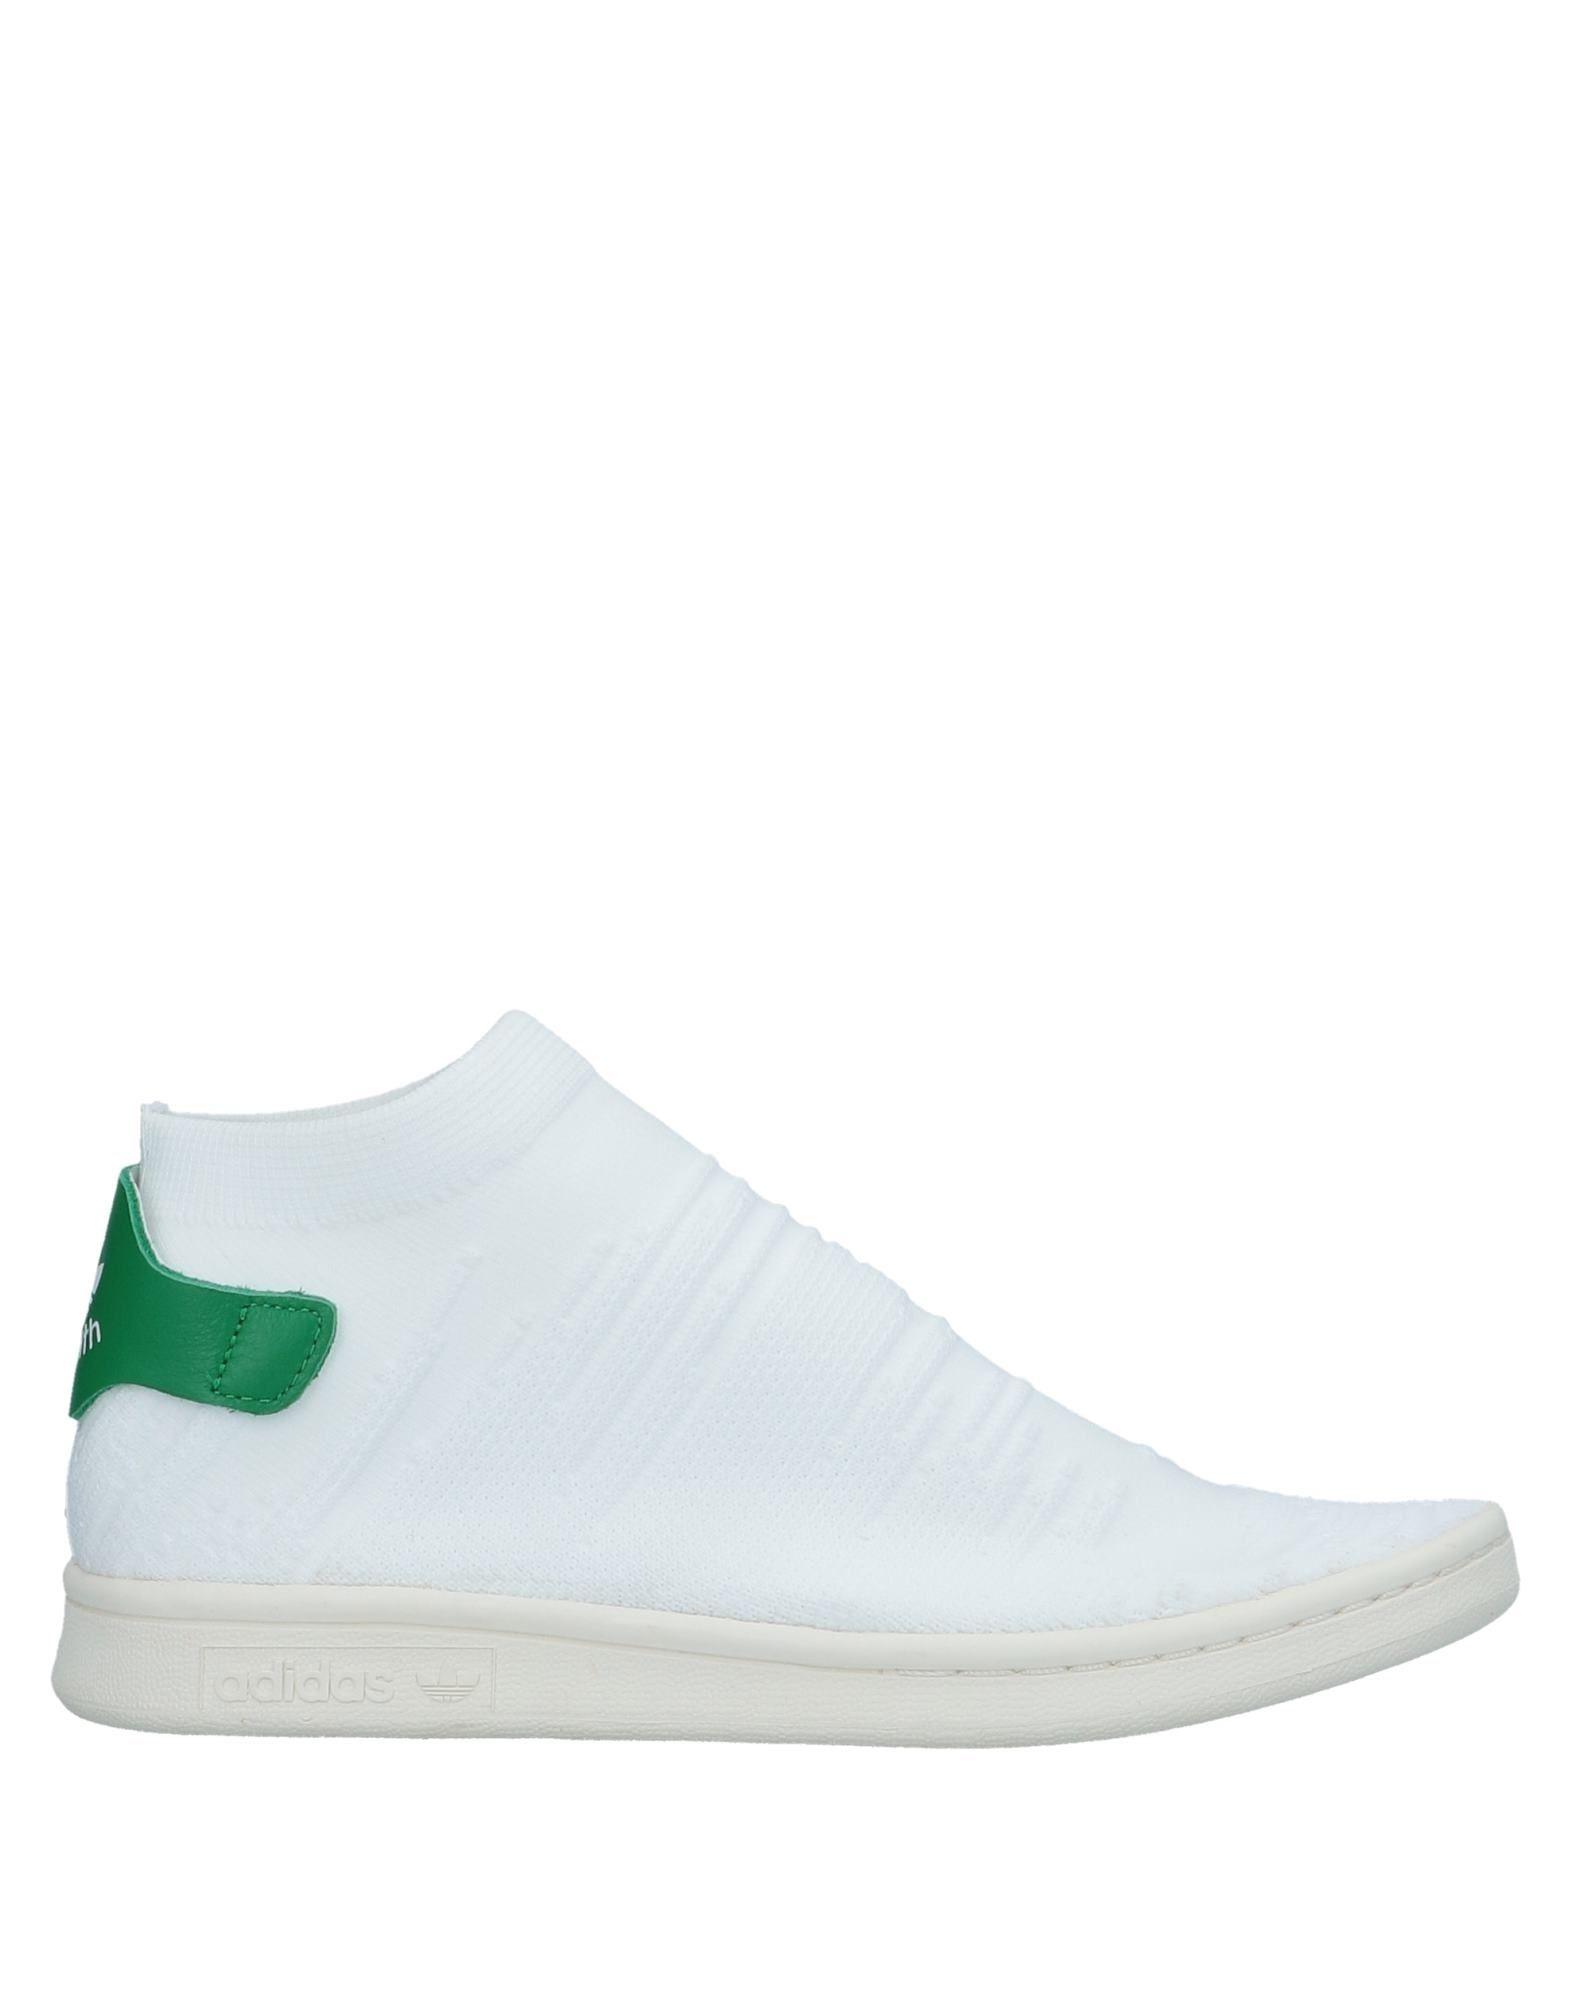 Sneakers Adidas Originals Donna - 11537201IP